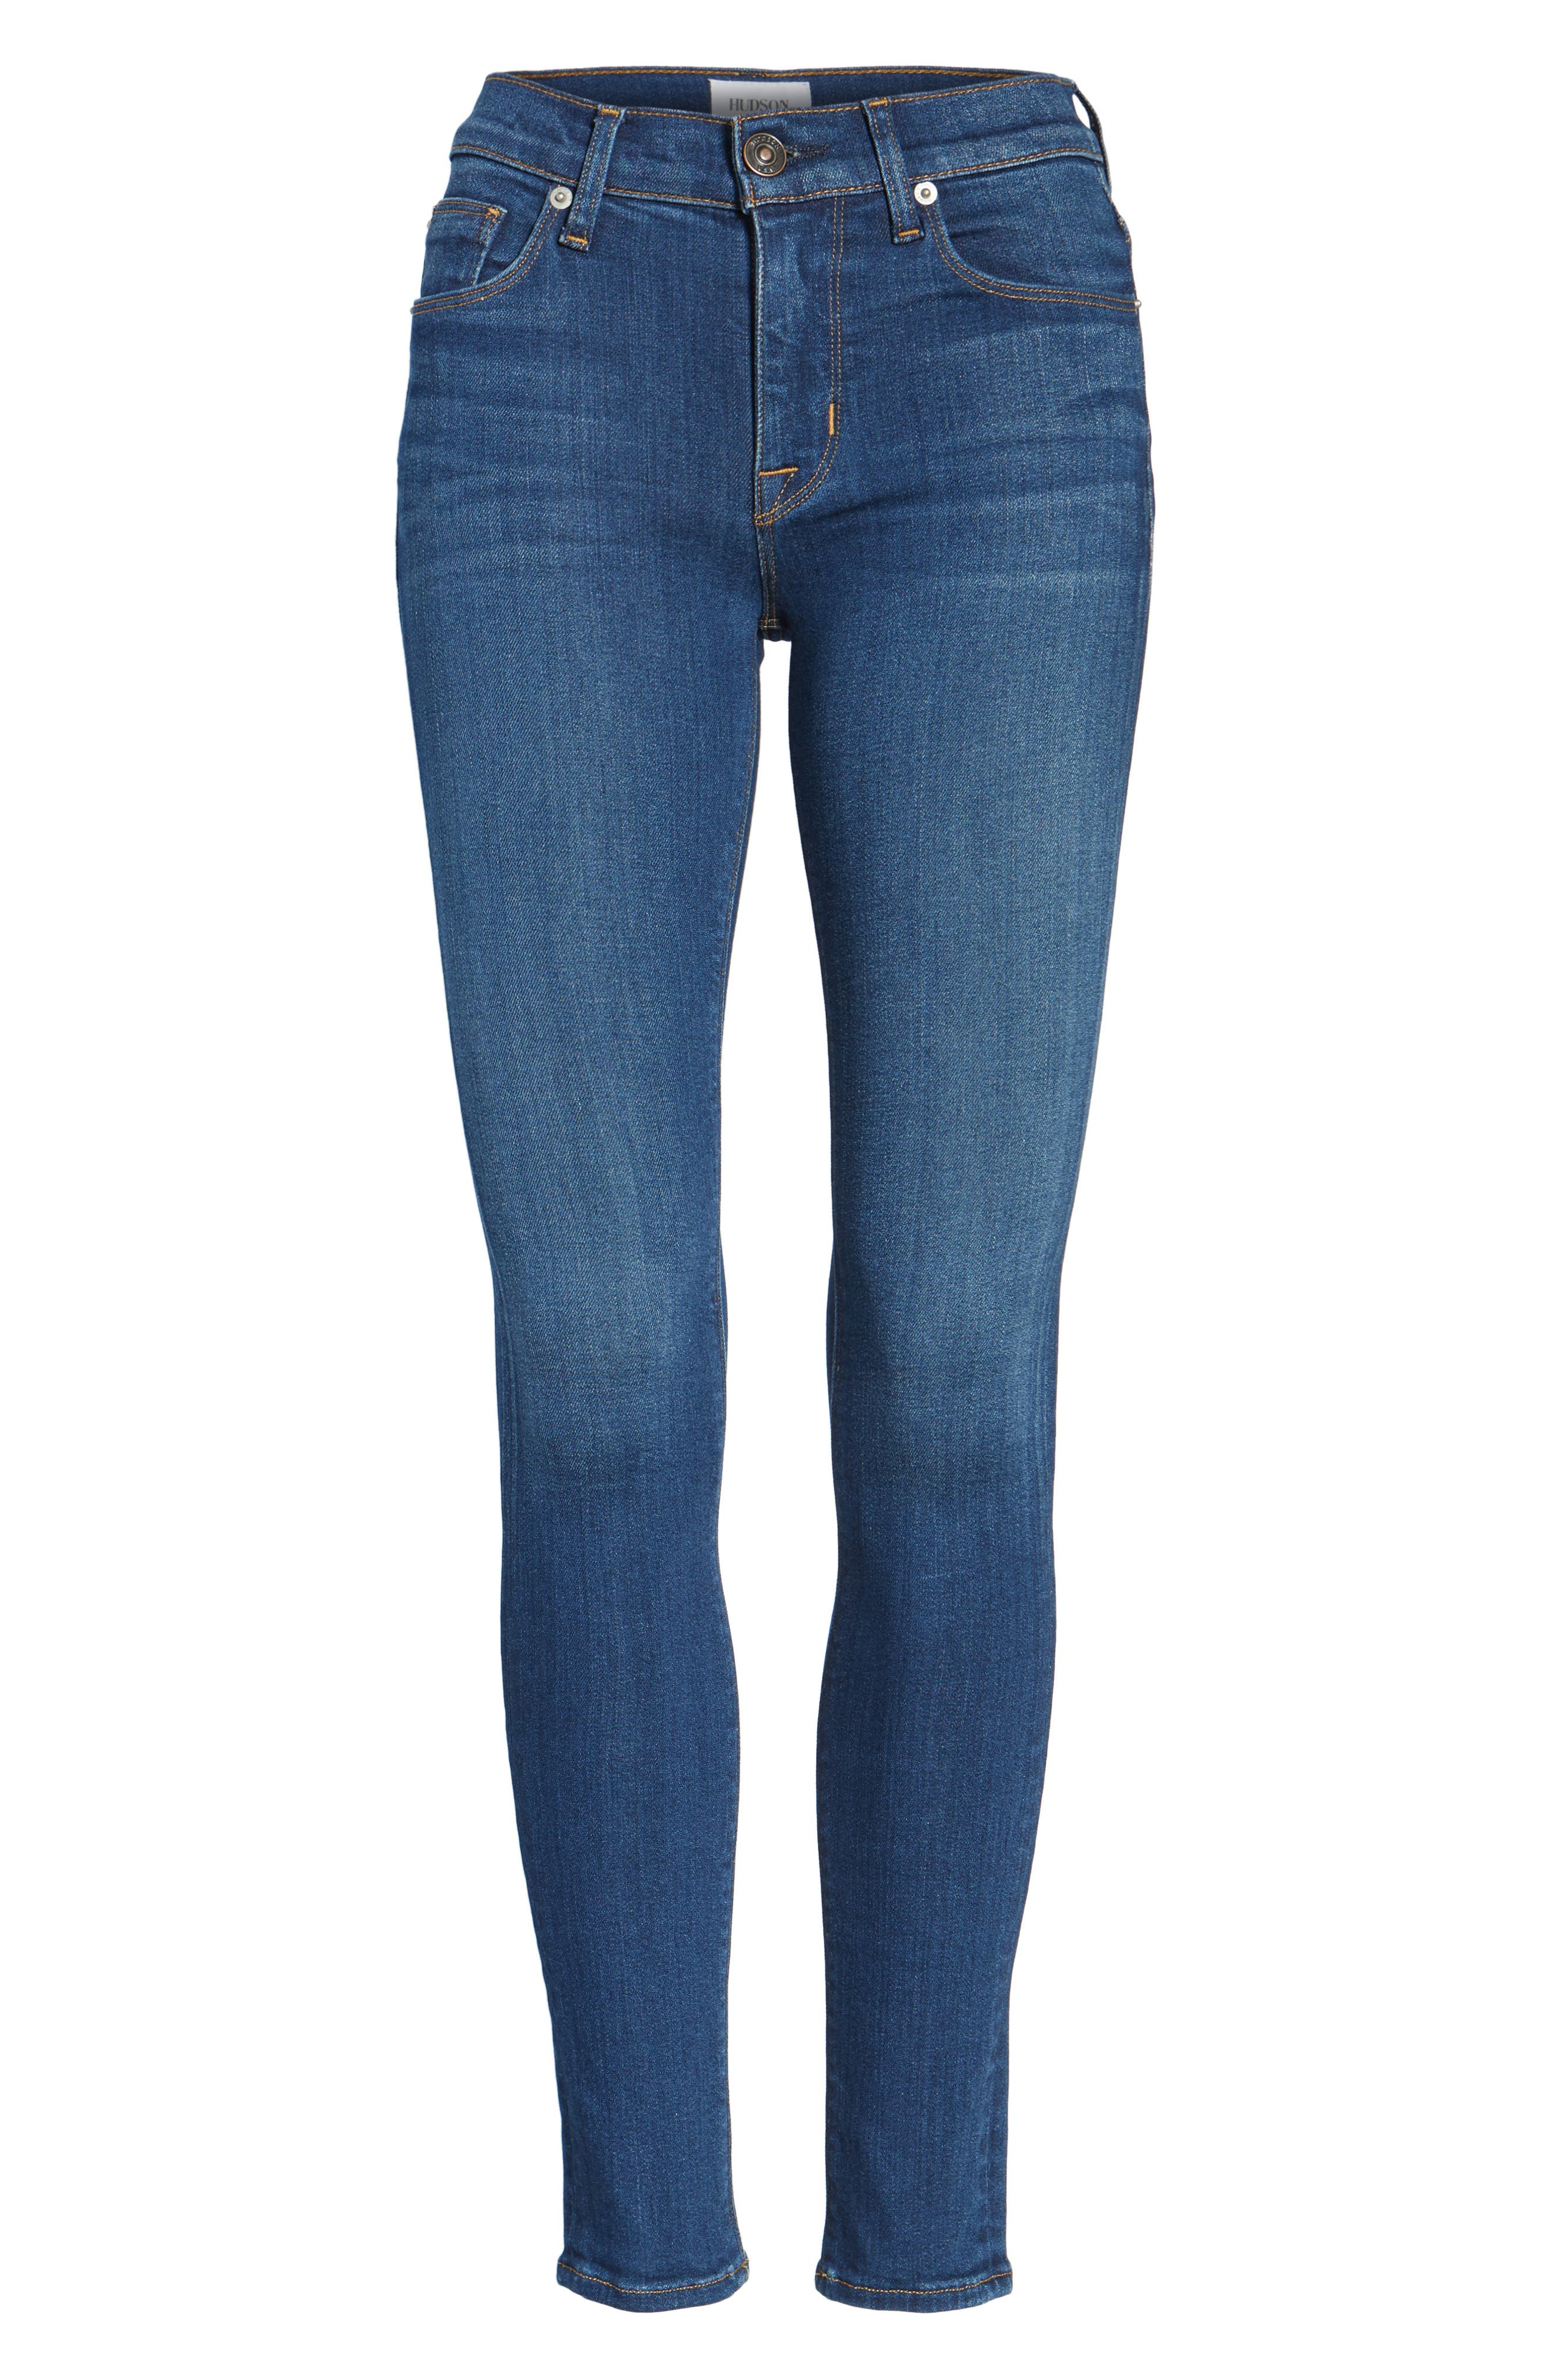 Hudson Nico Mid Rise Super Skinny Jeans,                             Alternate thumbnail 7, color,                             420